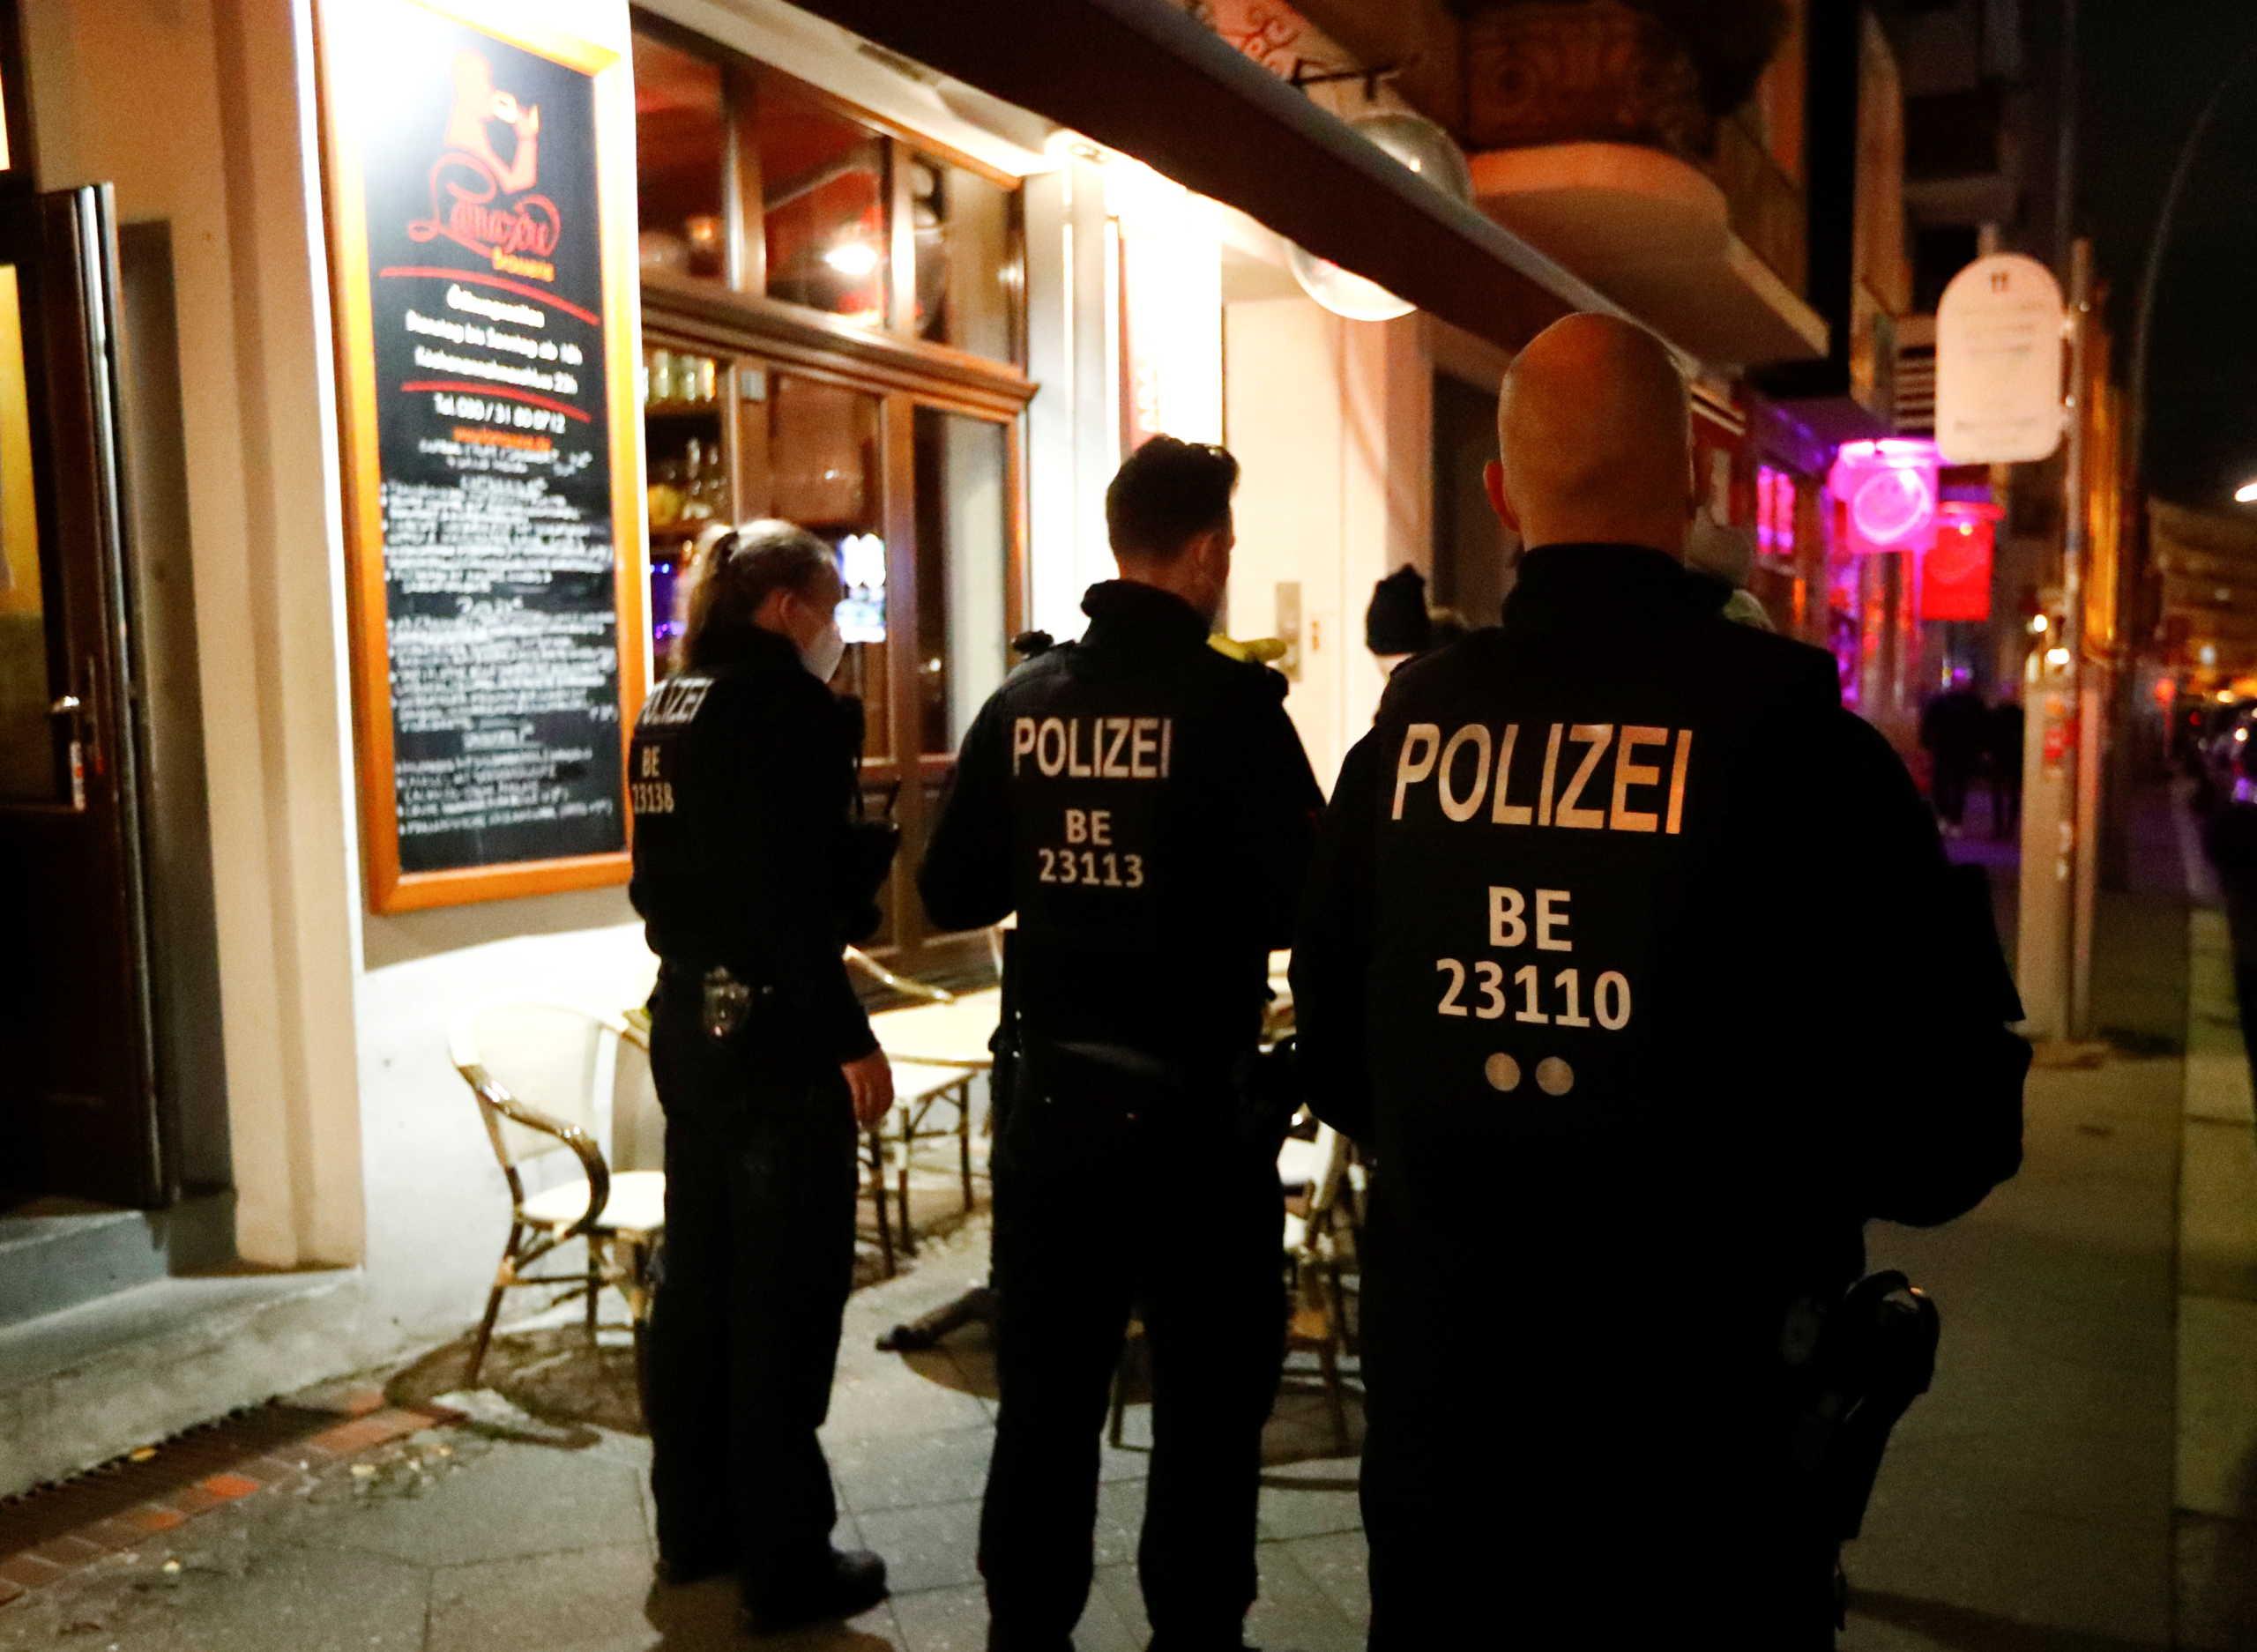 Spiegel: Αδέρφια τζιχαντιστές σχεδίαζαν τρομοκρατική επίθεση στην Ευρώπη